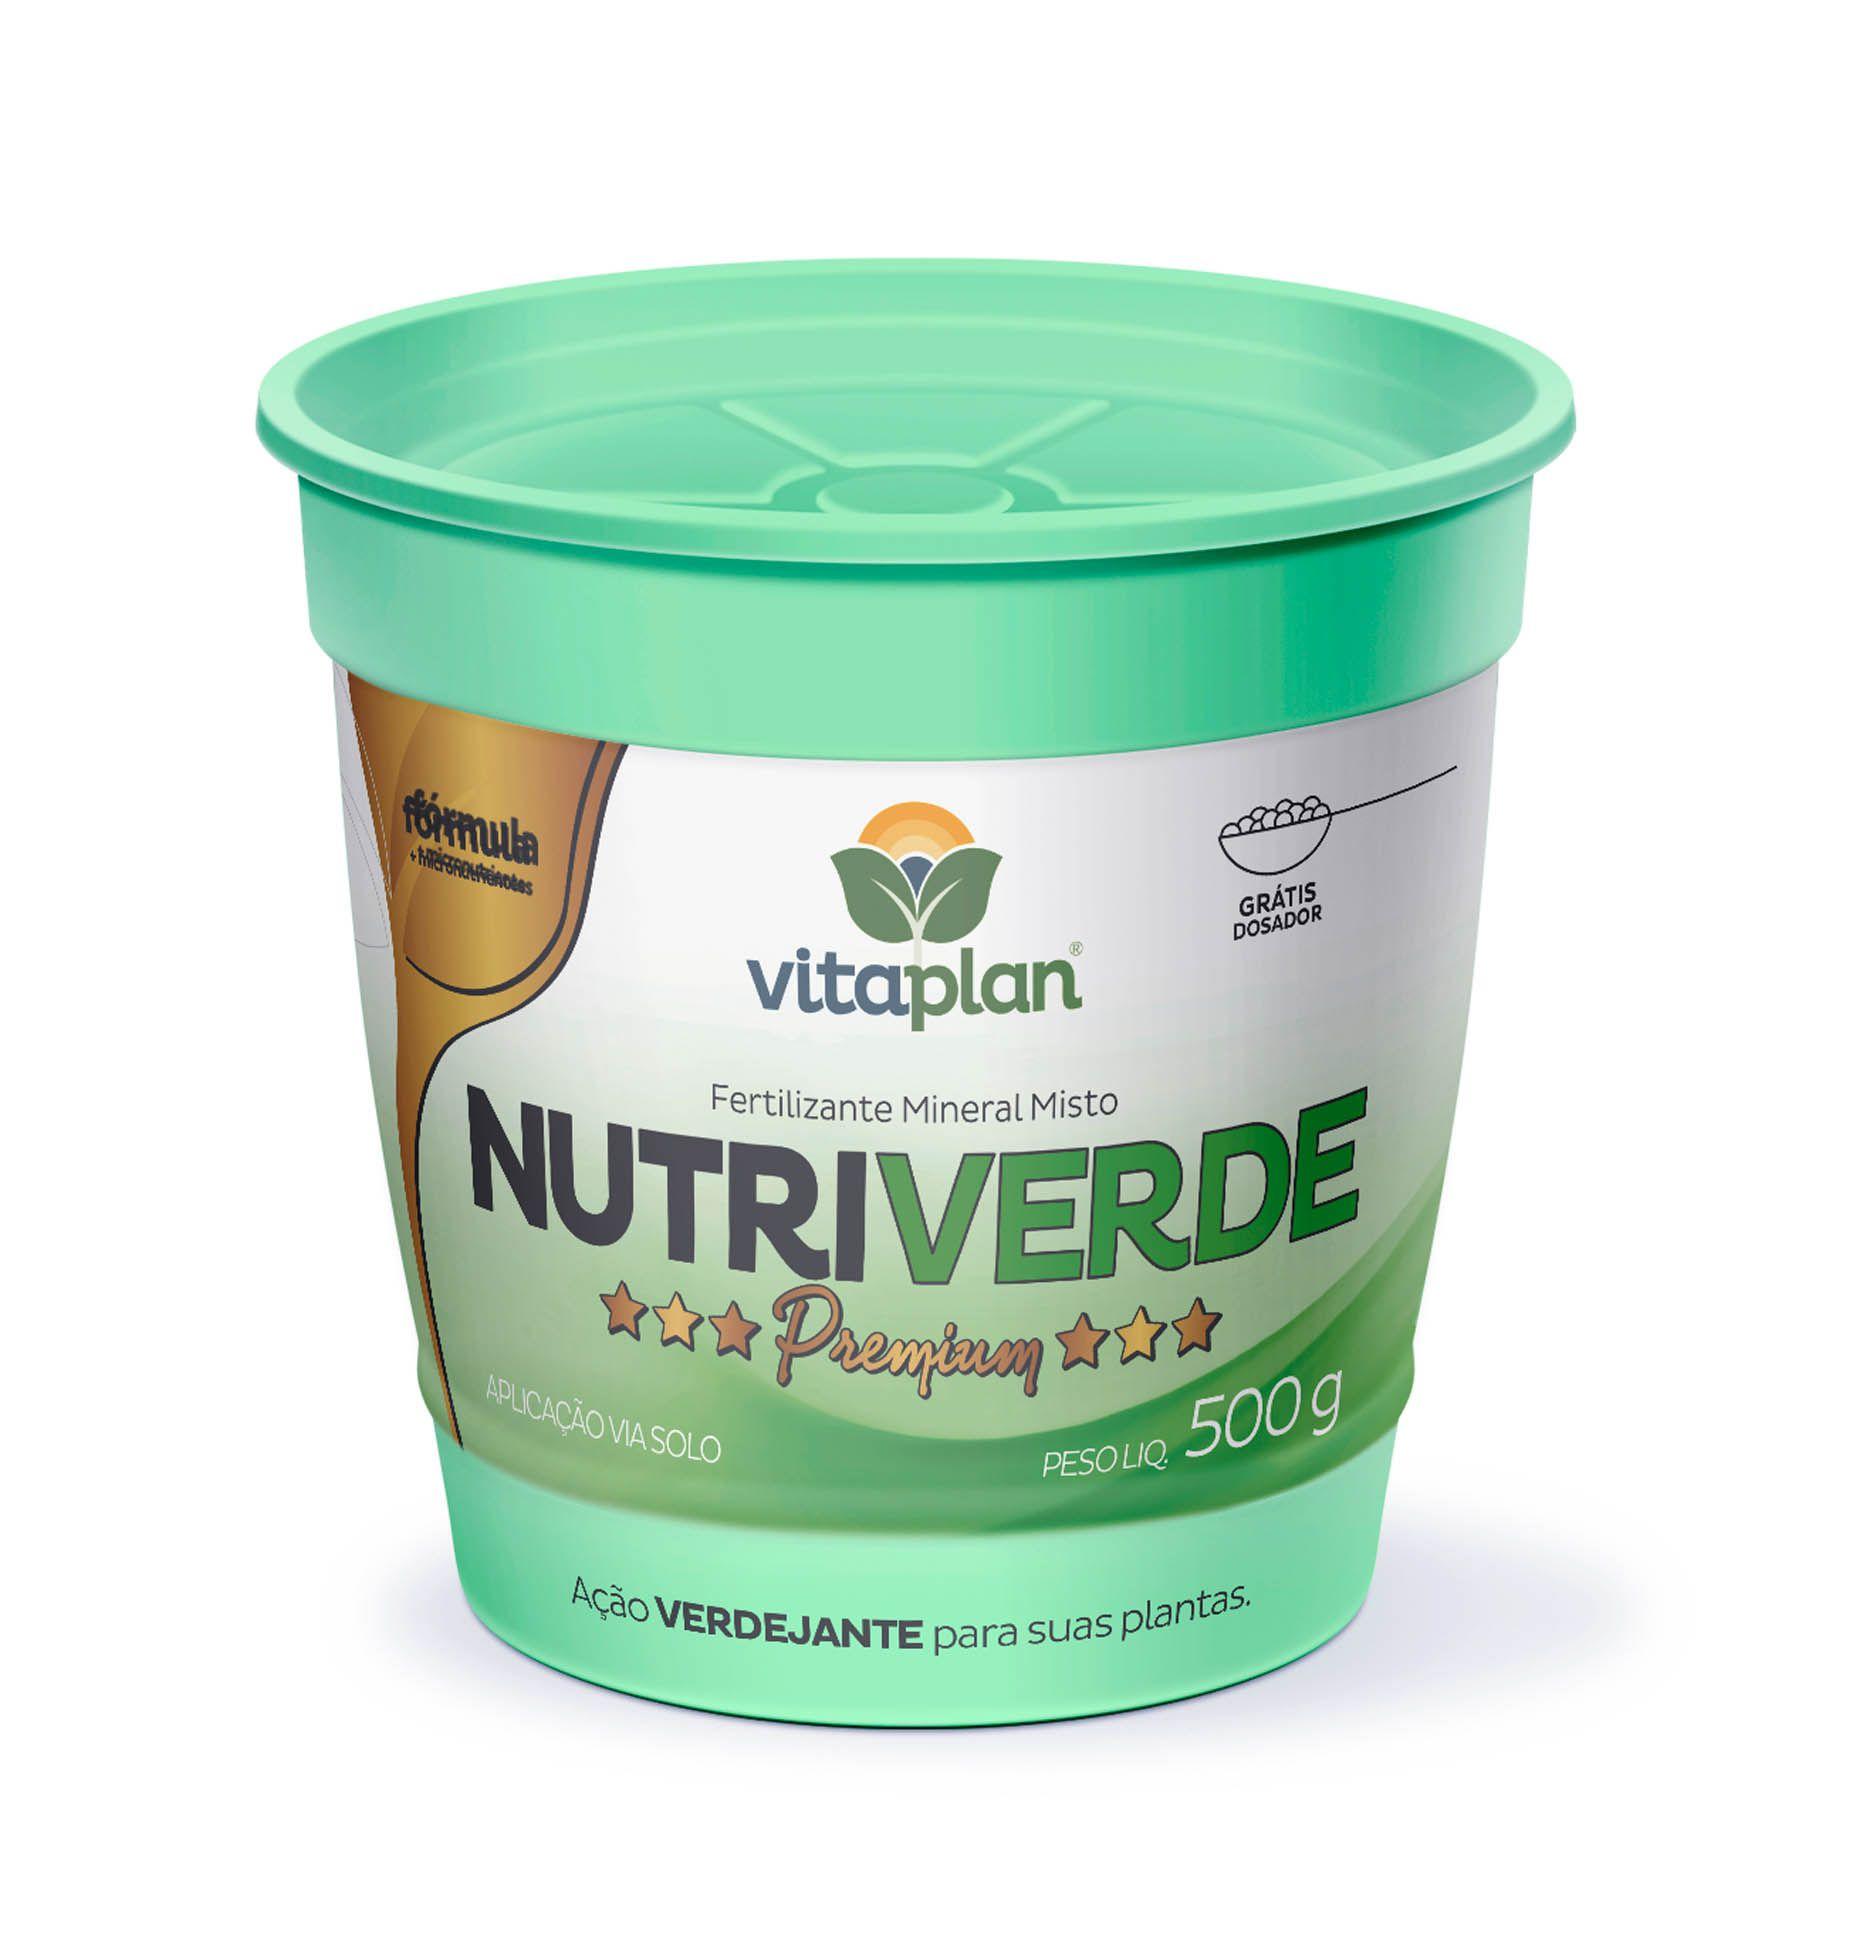 Fertilizante Mineral Misto Nutriverde 500g - Vitaplan Premium